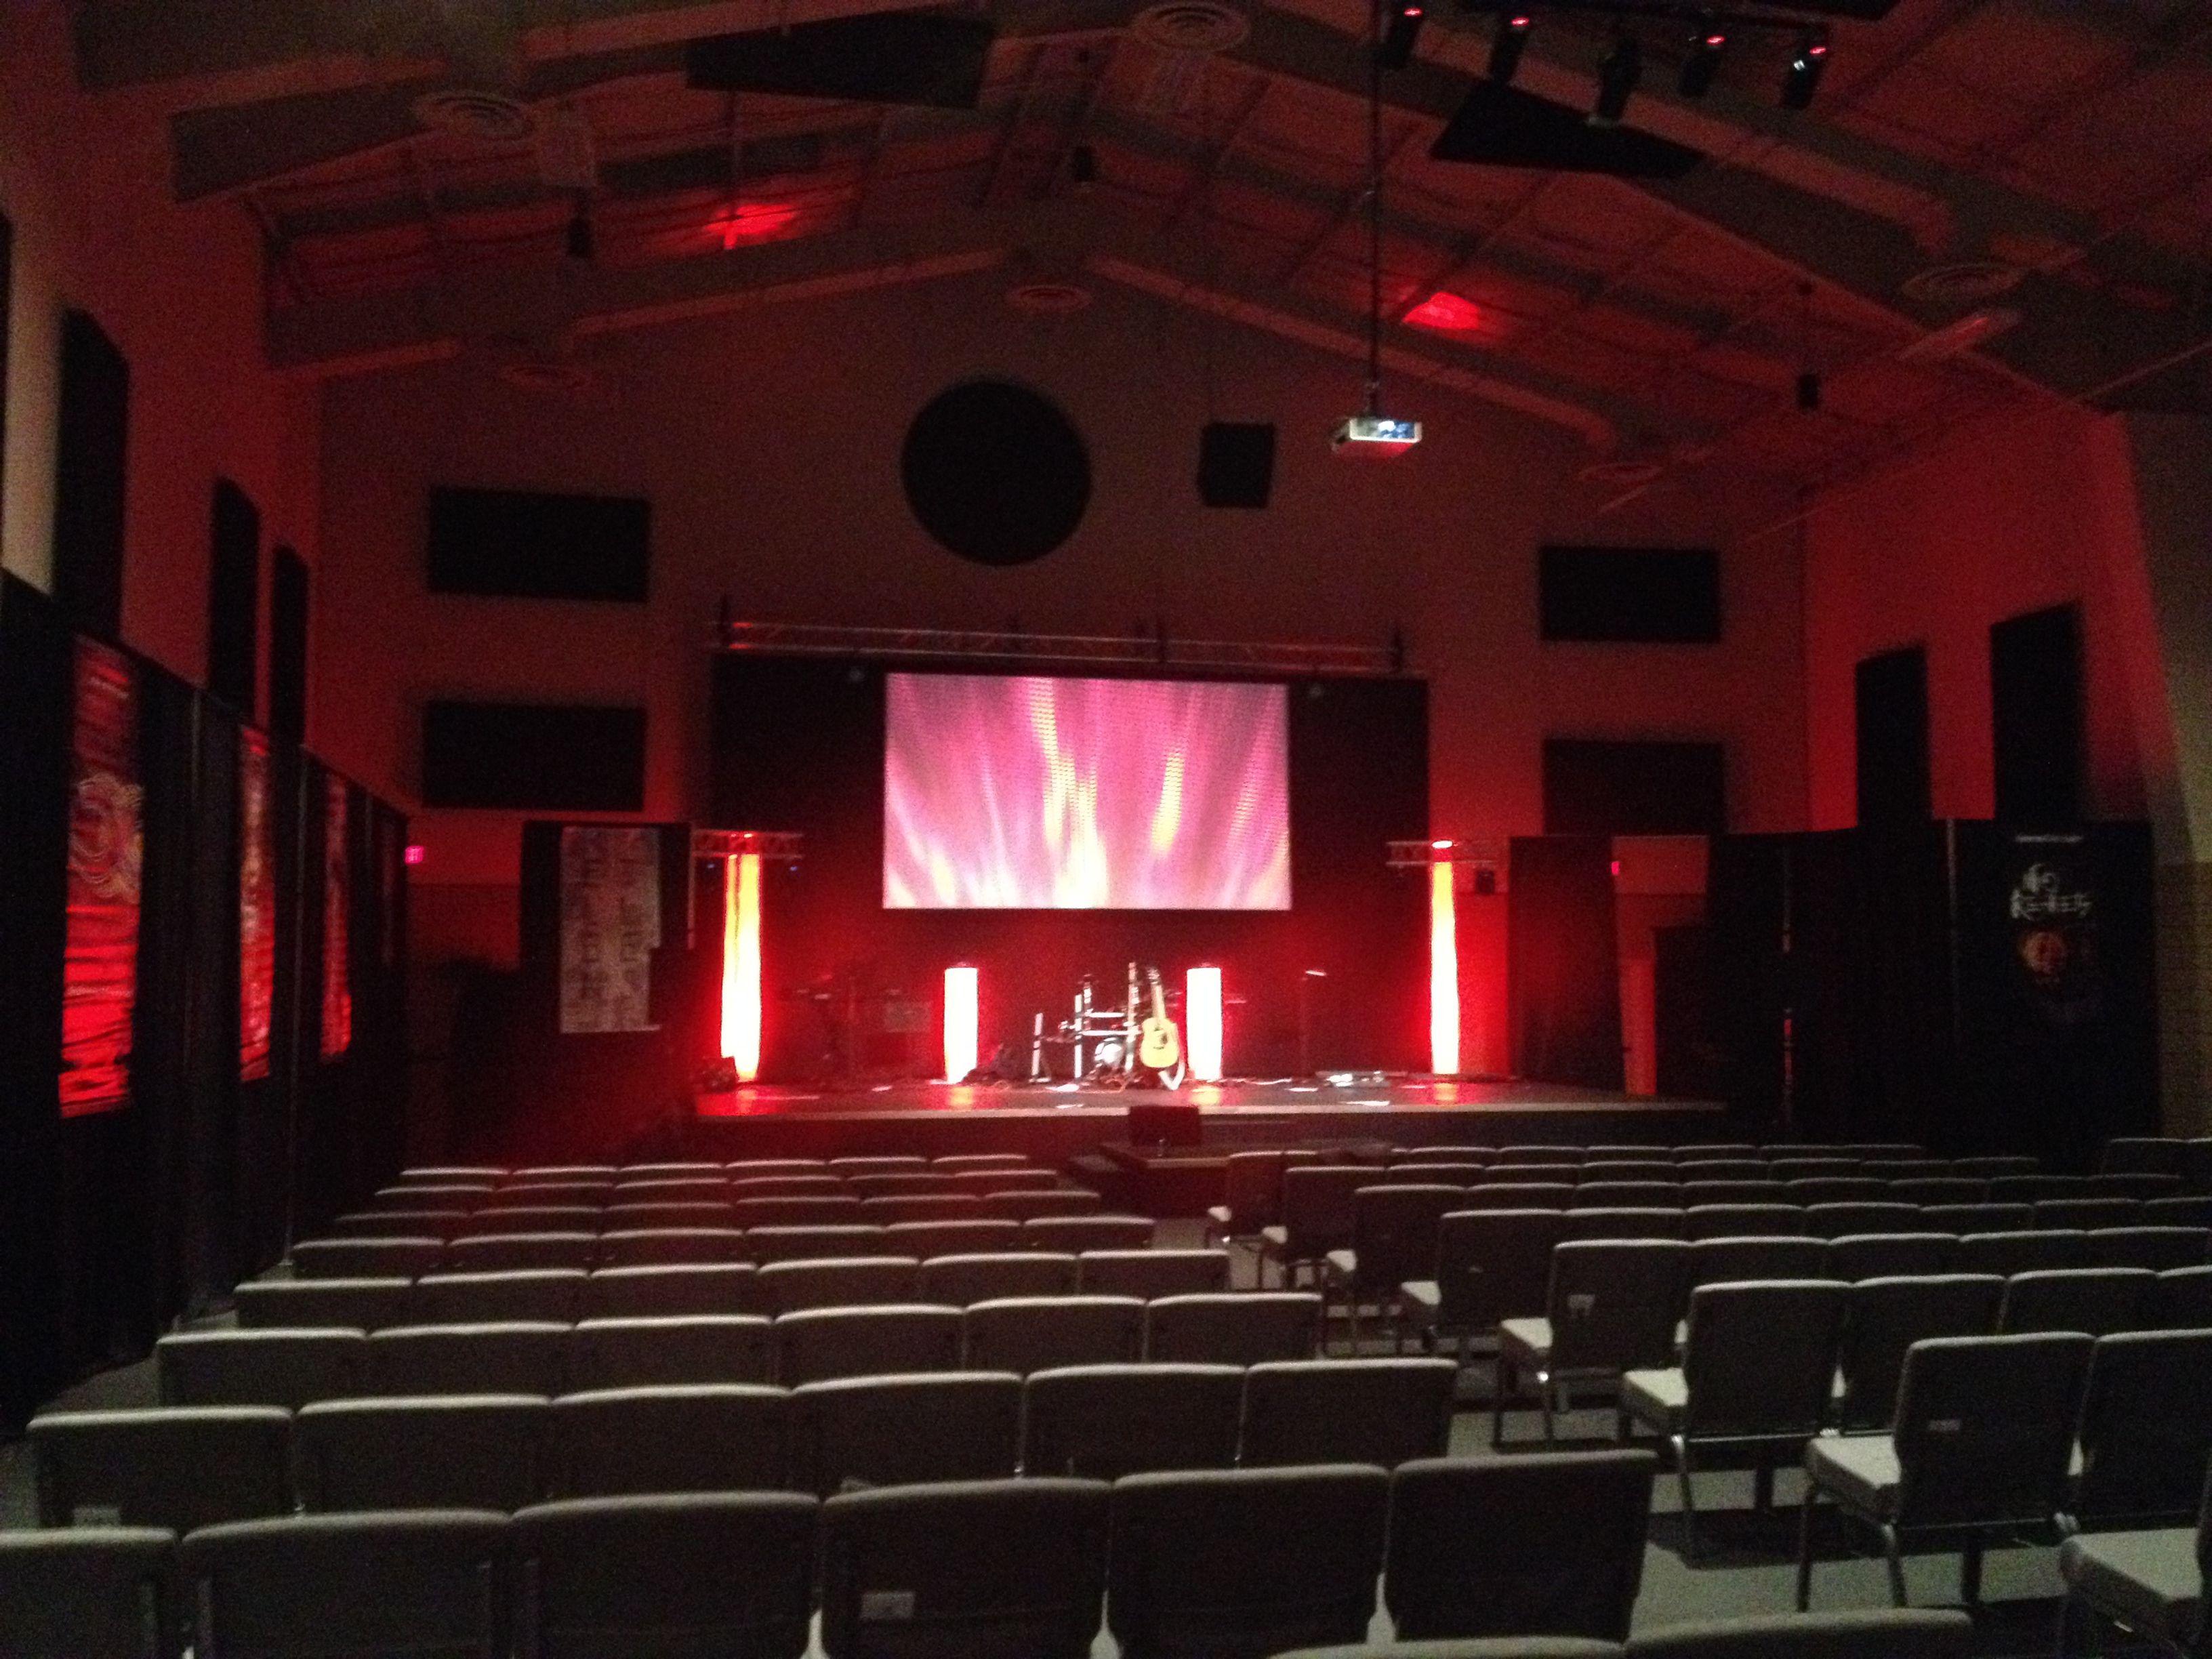 Gym Venue, Christ's Place Church, Lincoln, NE Design